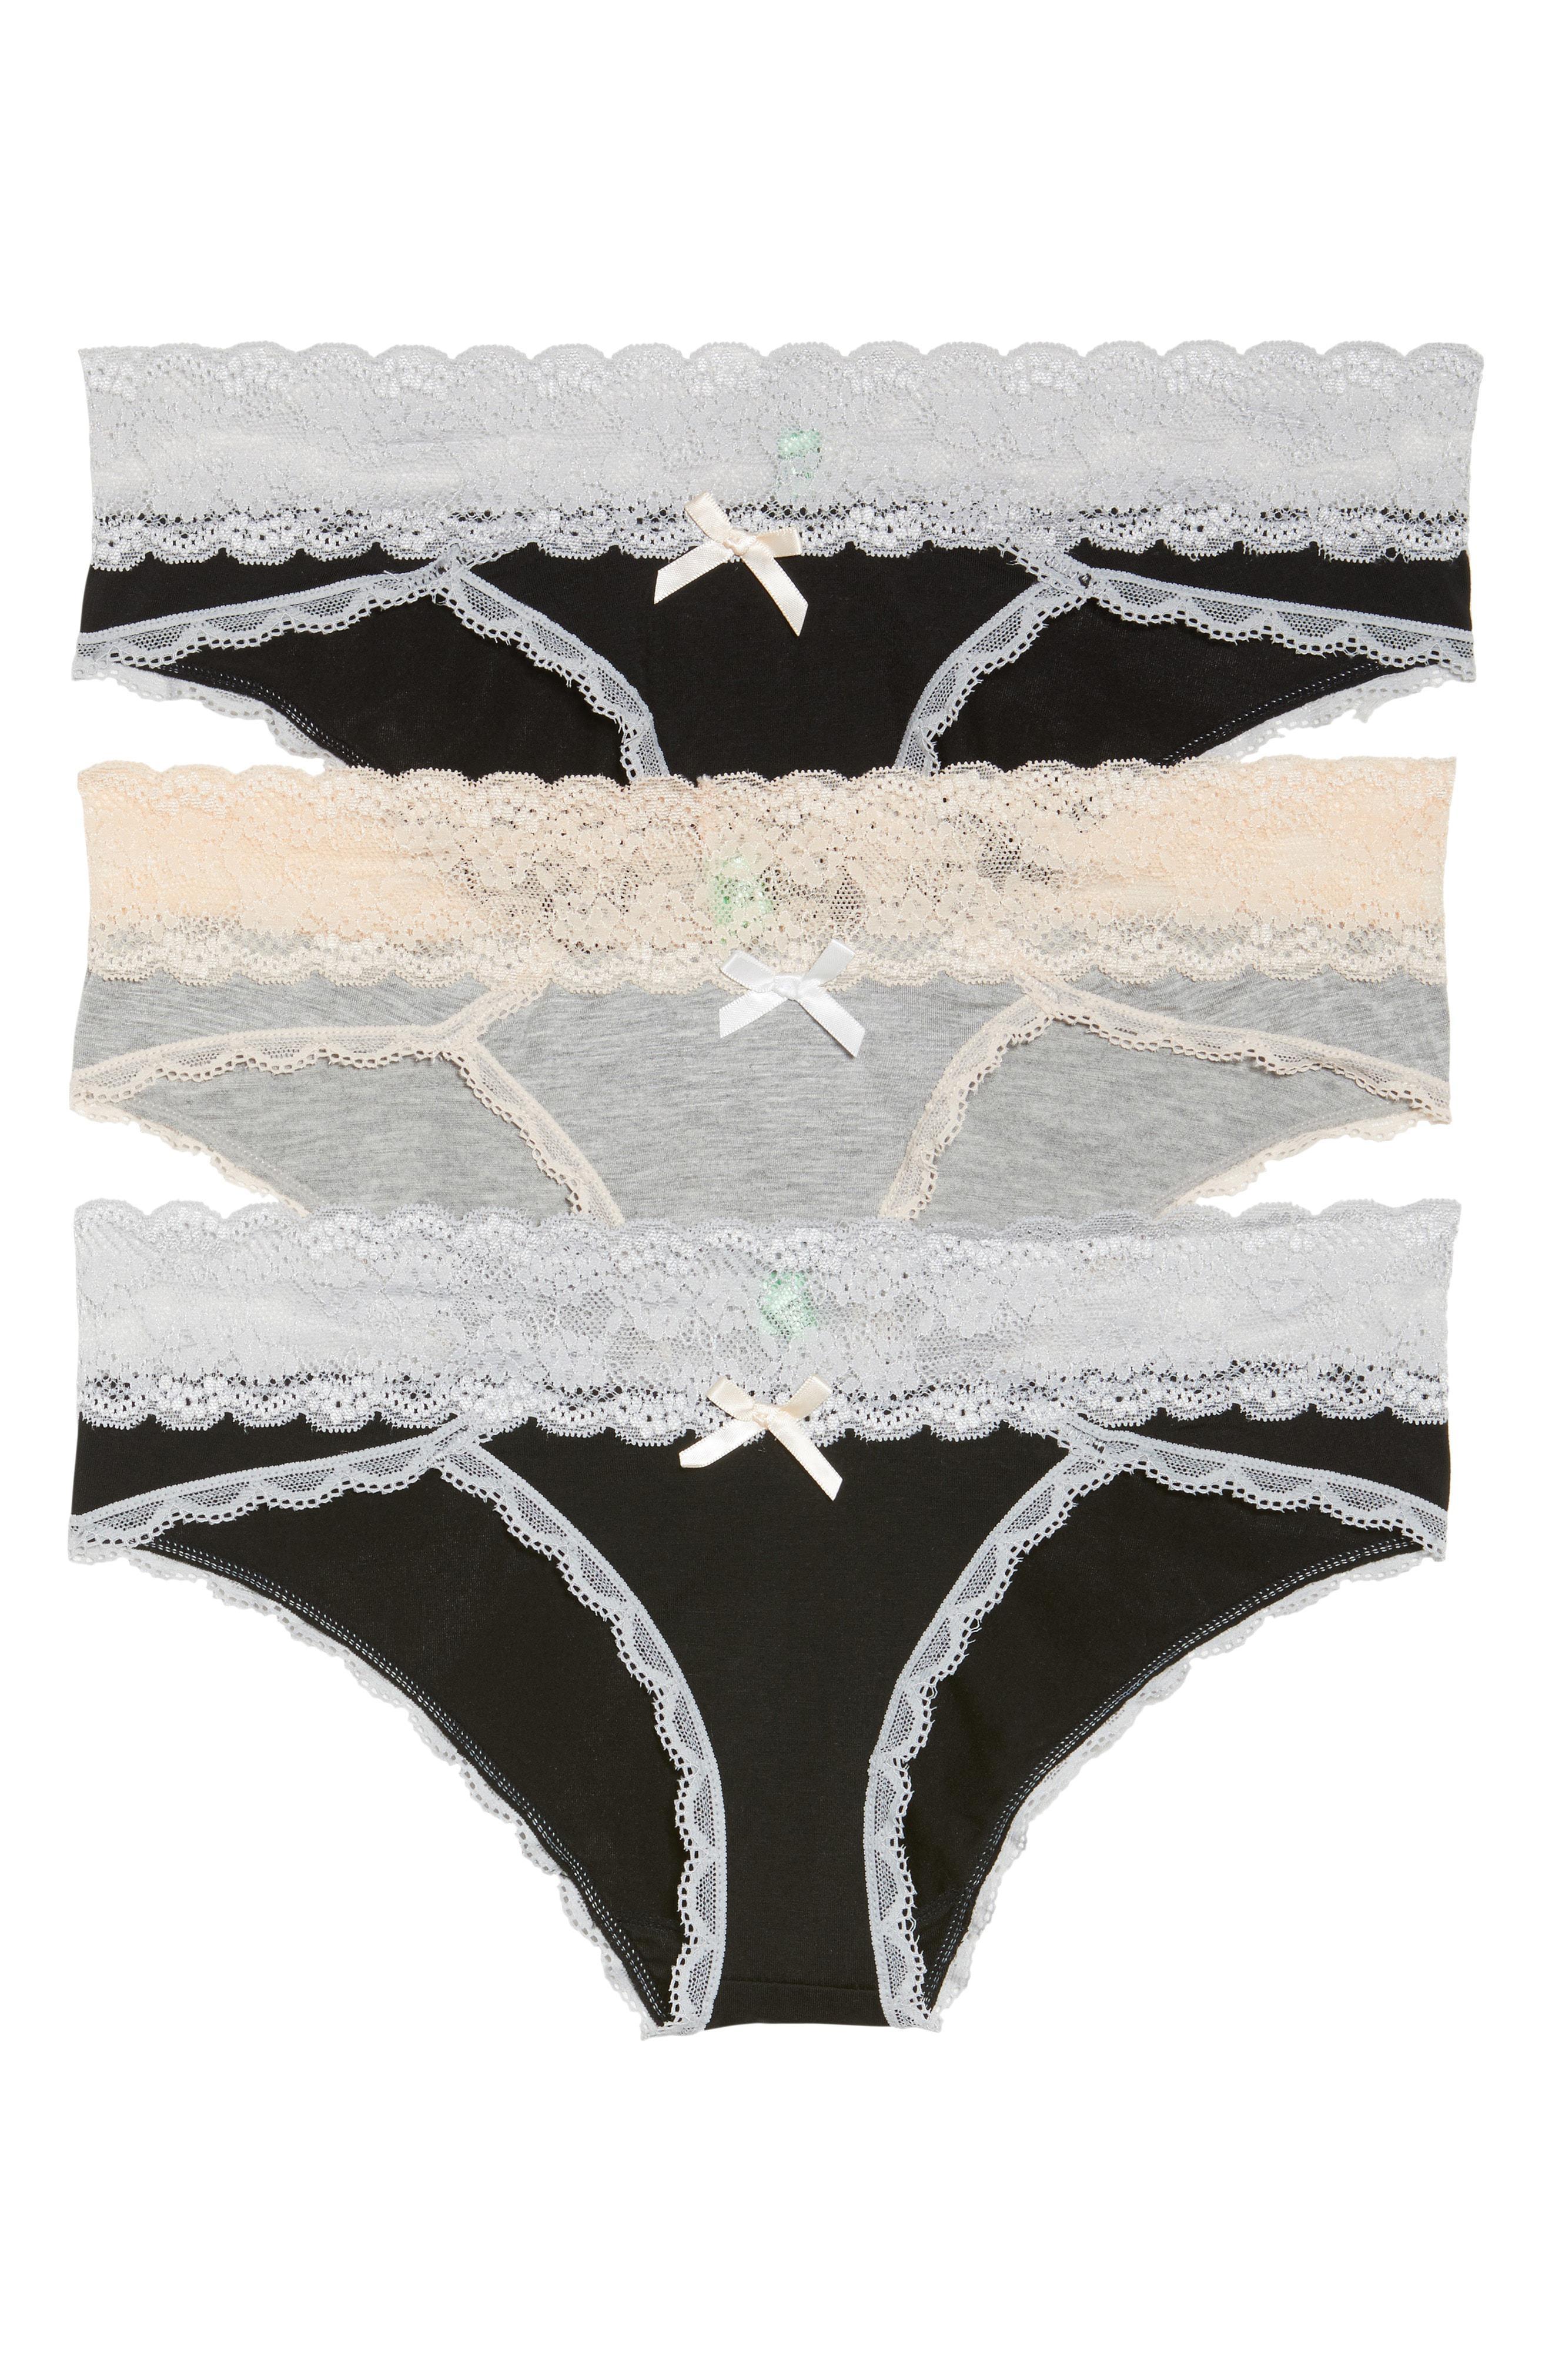 05b91ec96e06 Lyst - Honeydew Intimates 3-pack Hipster Panty, Black in Black